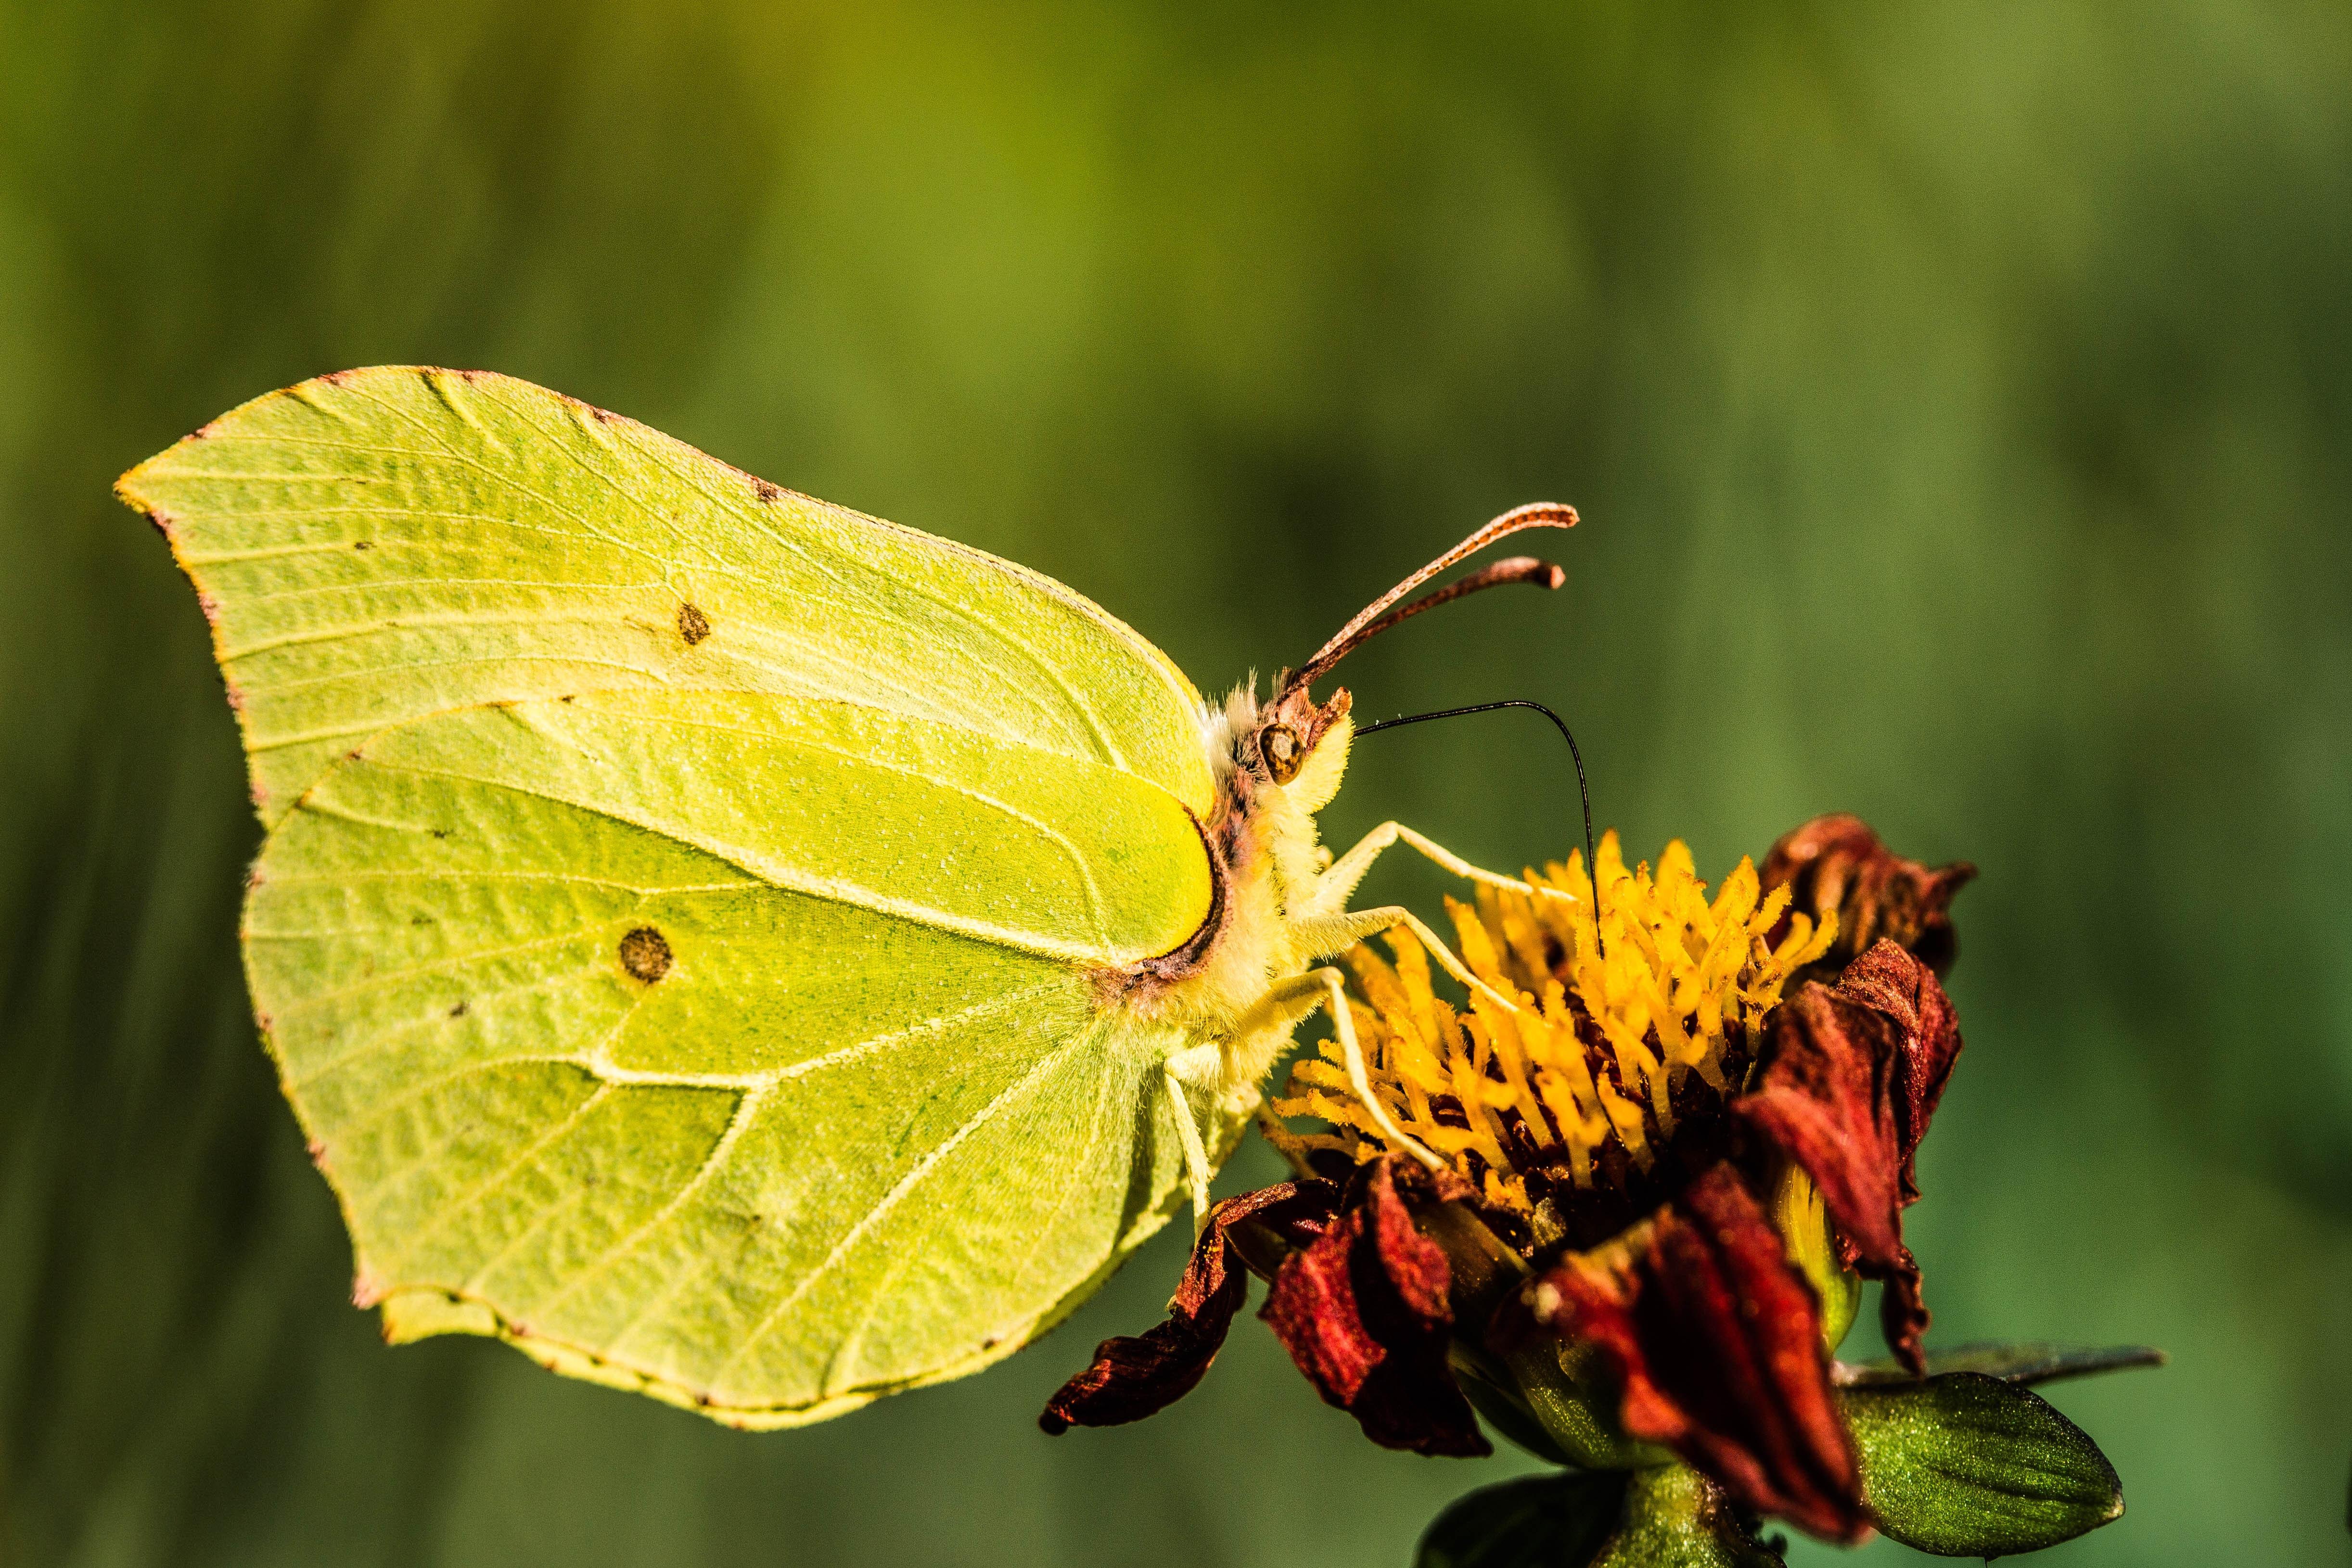 free images nature leaf animal summer insect botany